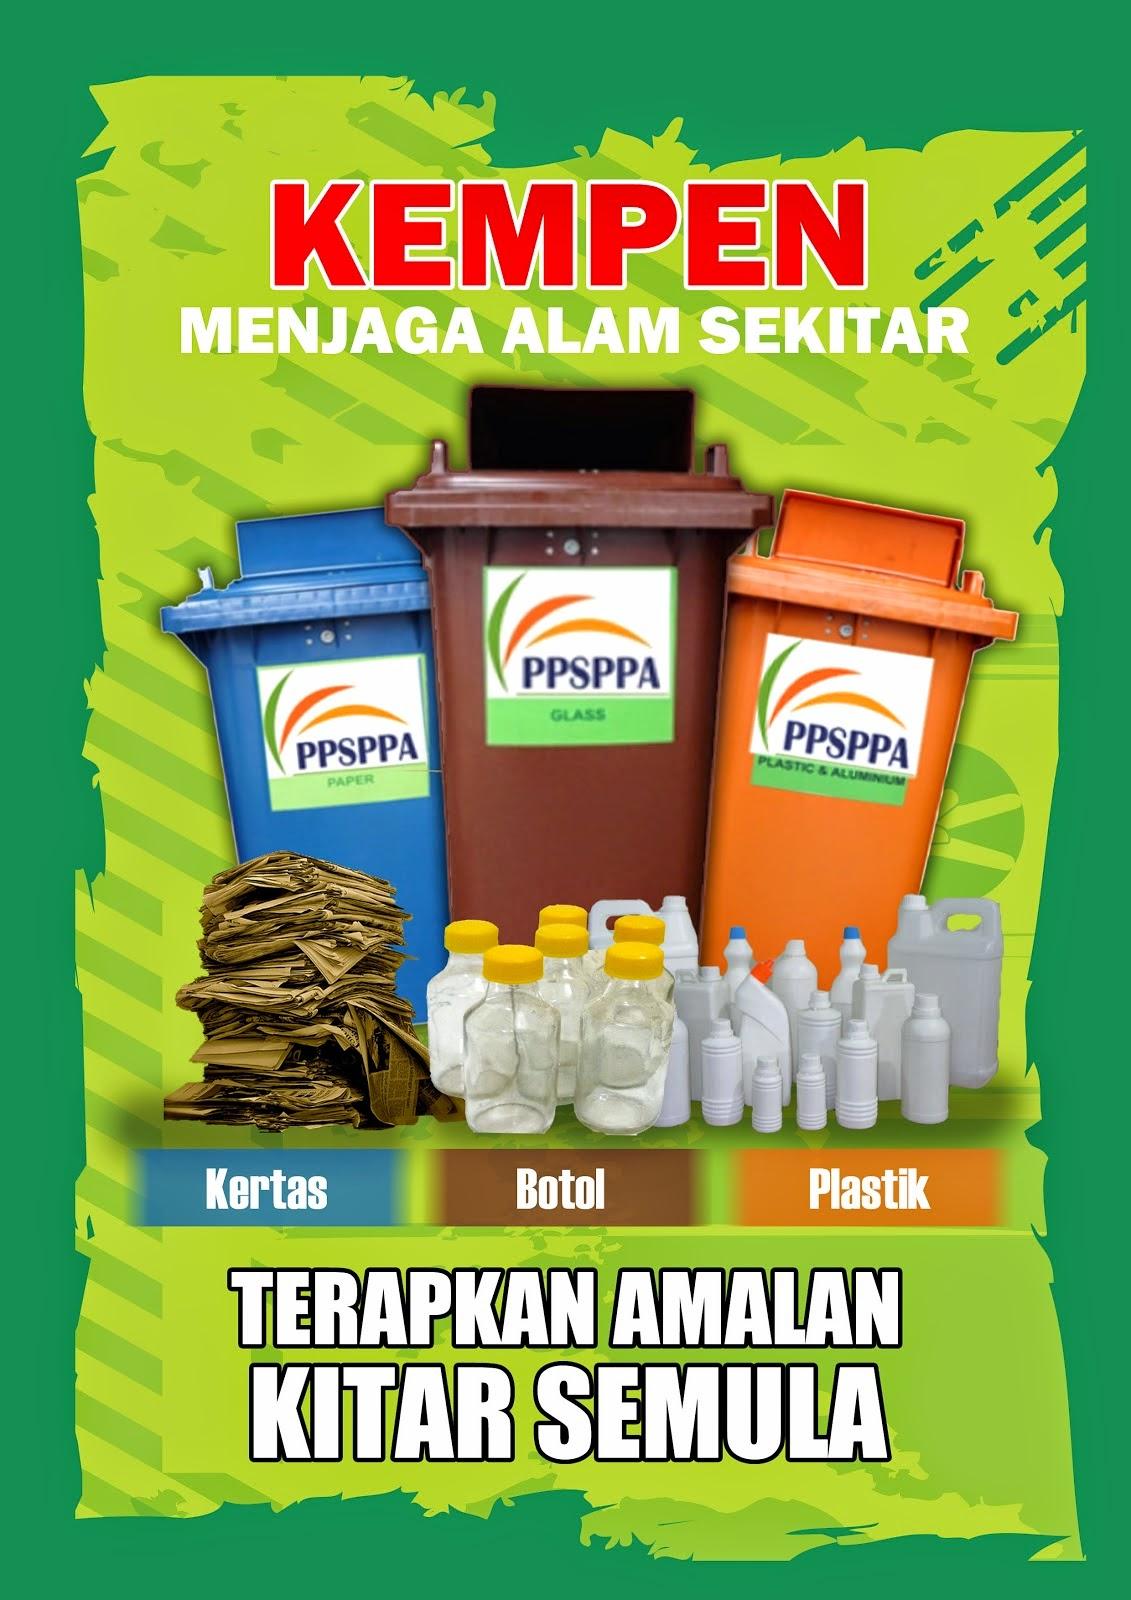 KEMPEN 3R